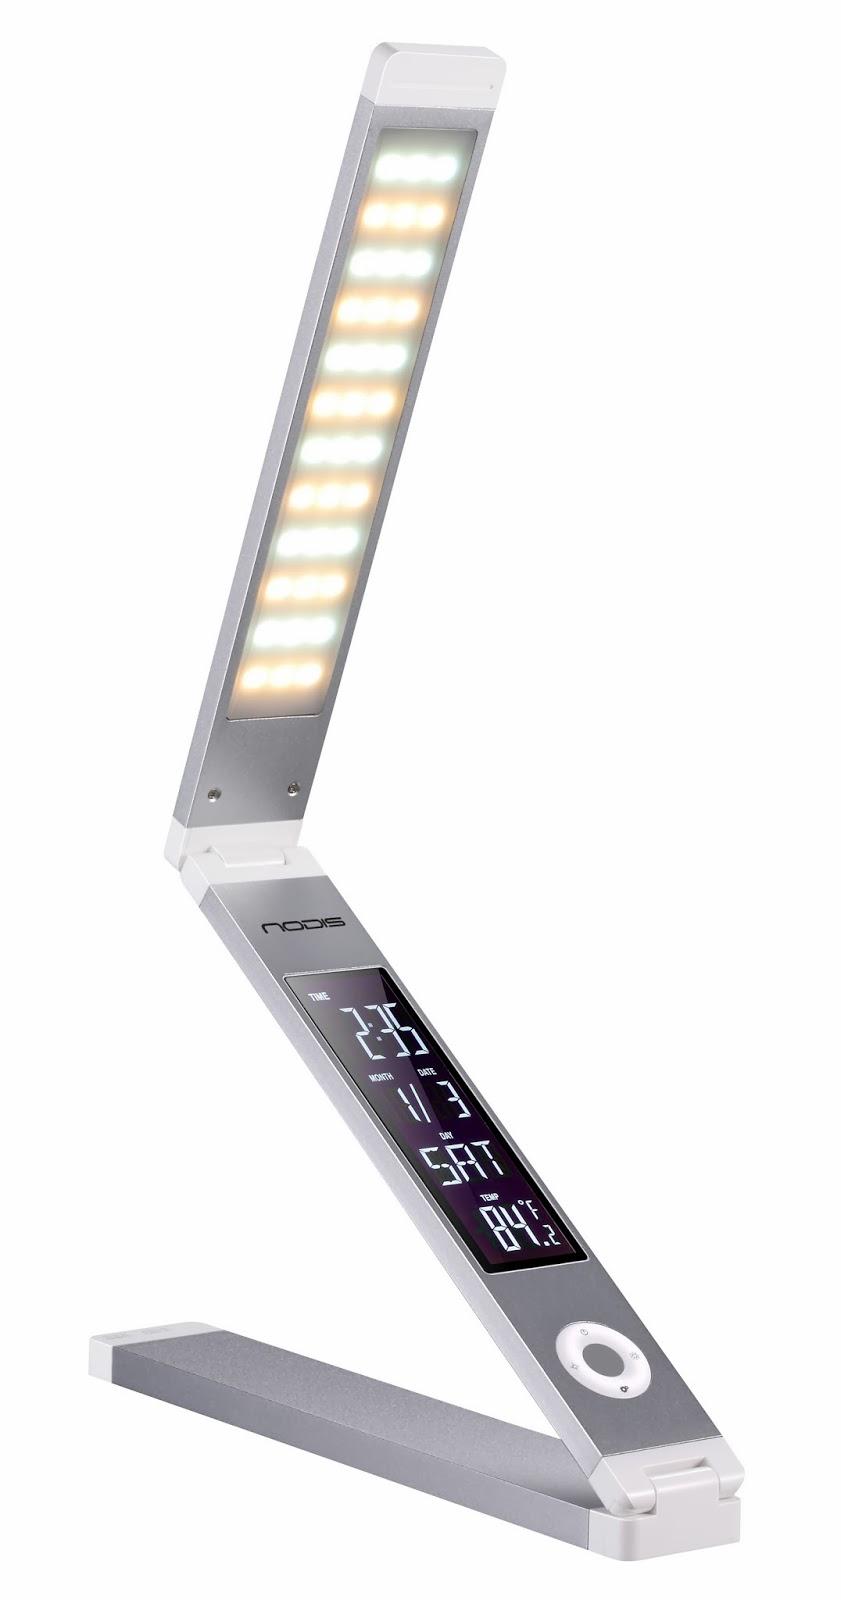 Fantechnology: Lampade Time Light NODIS: la sincronia di ...